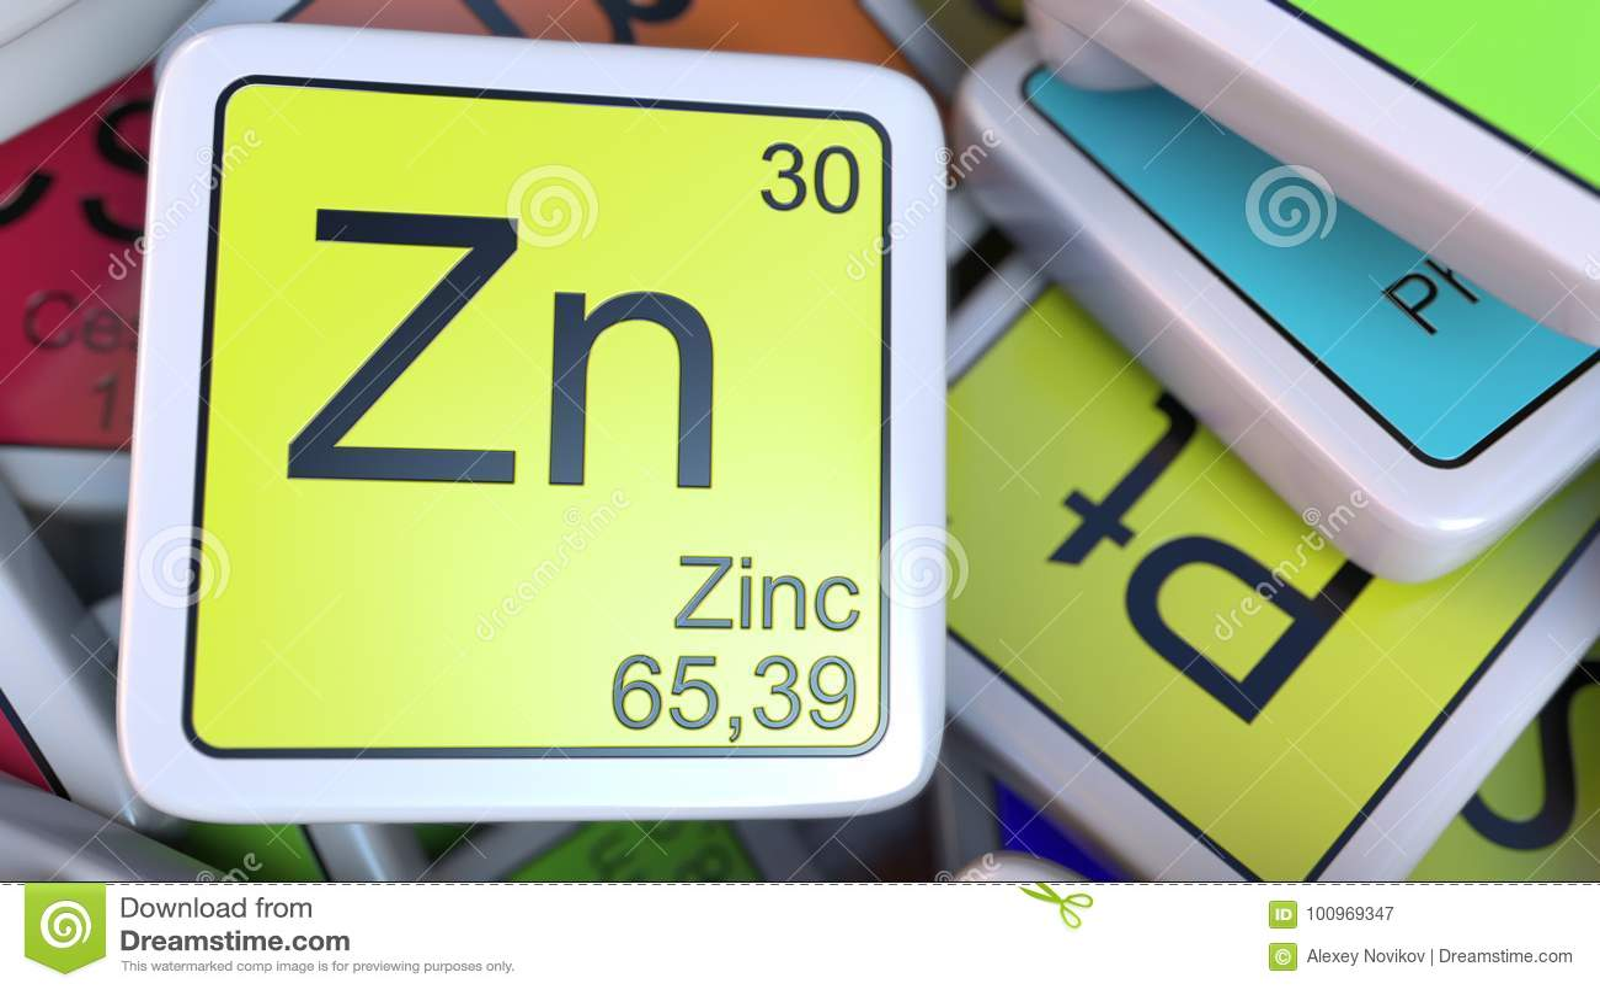 Bloque del zn del cinc en la pila de tabla peridica de los bloques download bloque del zn del cinc en la pila de tabla peridica de los bloques de urtaz Image collections